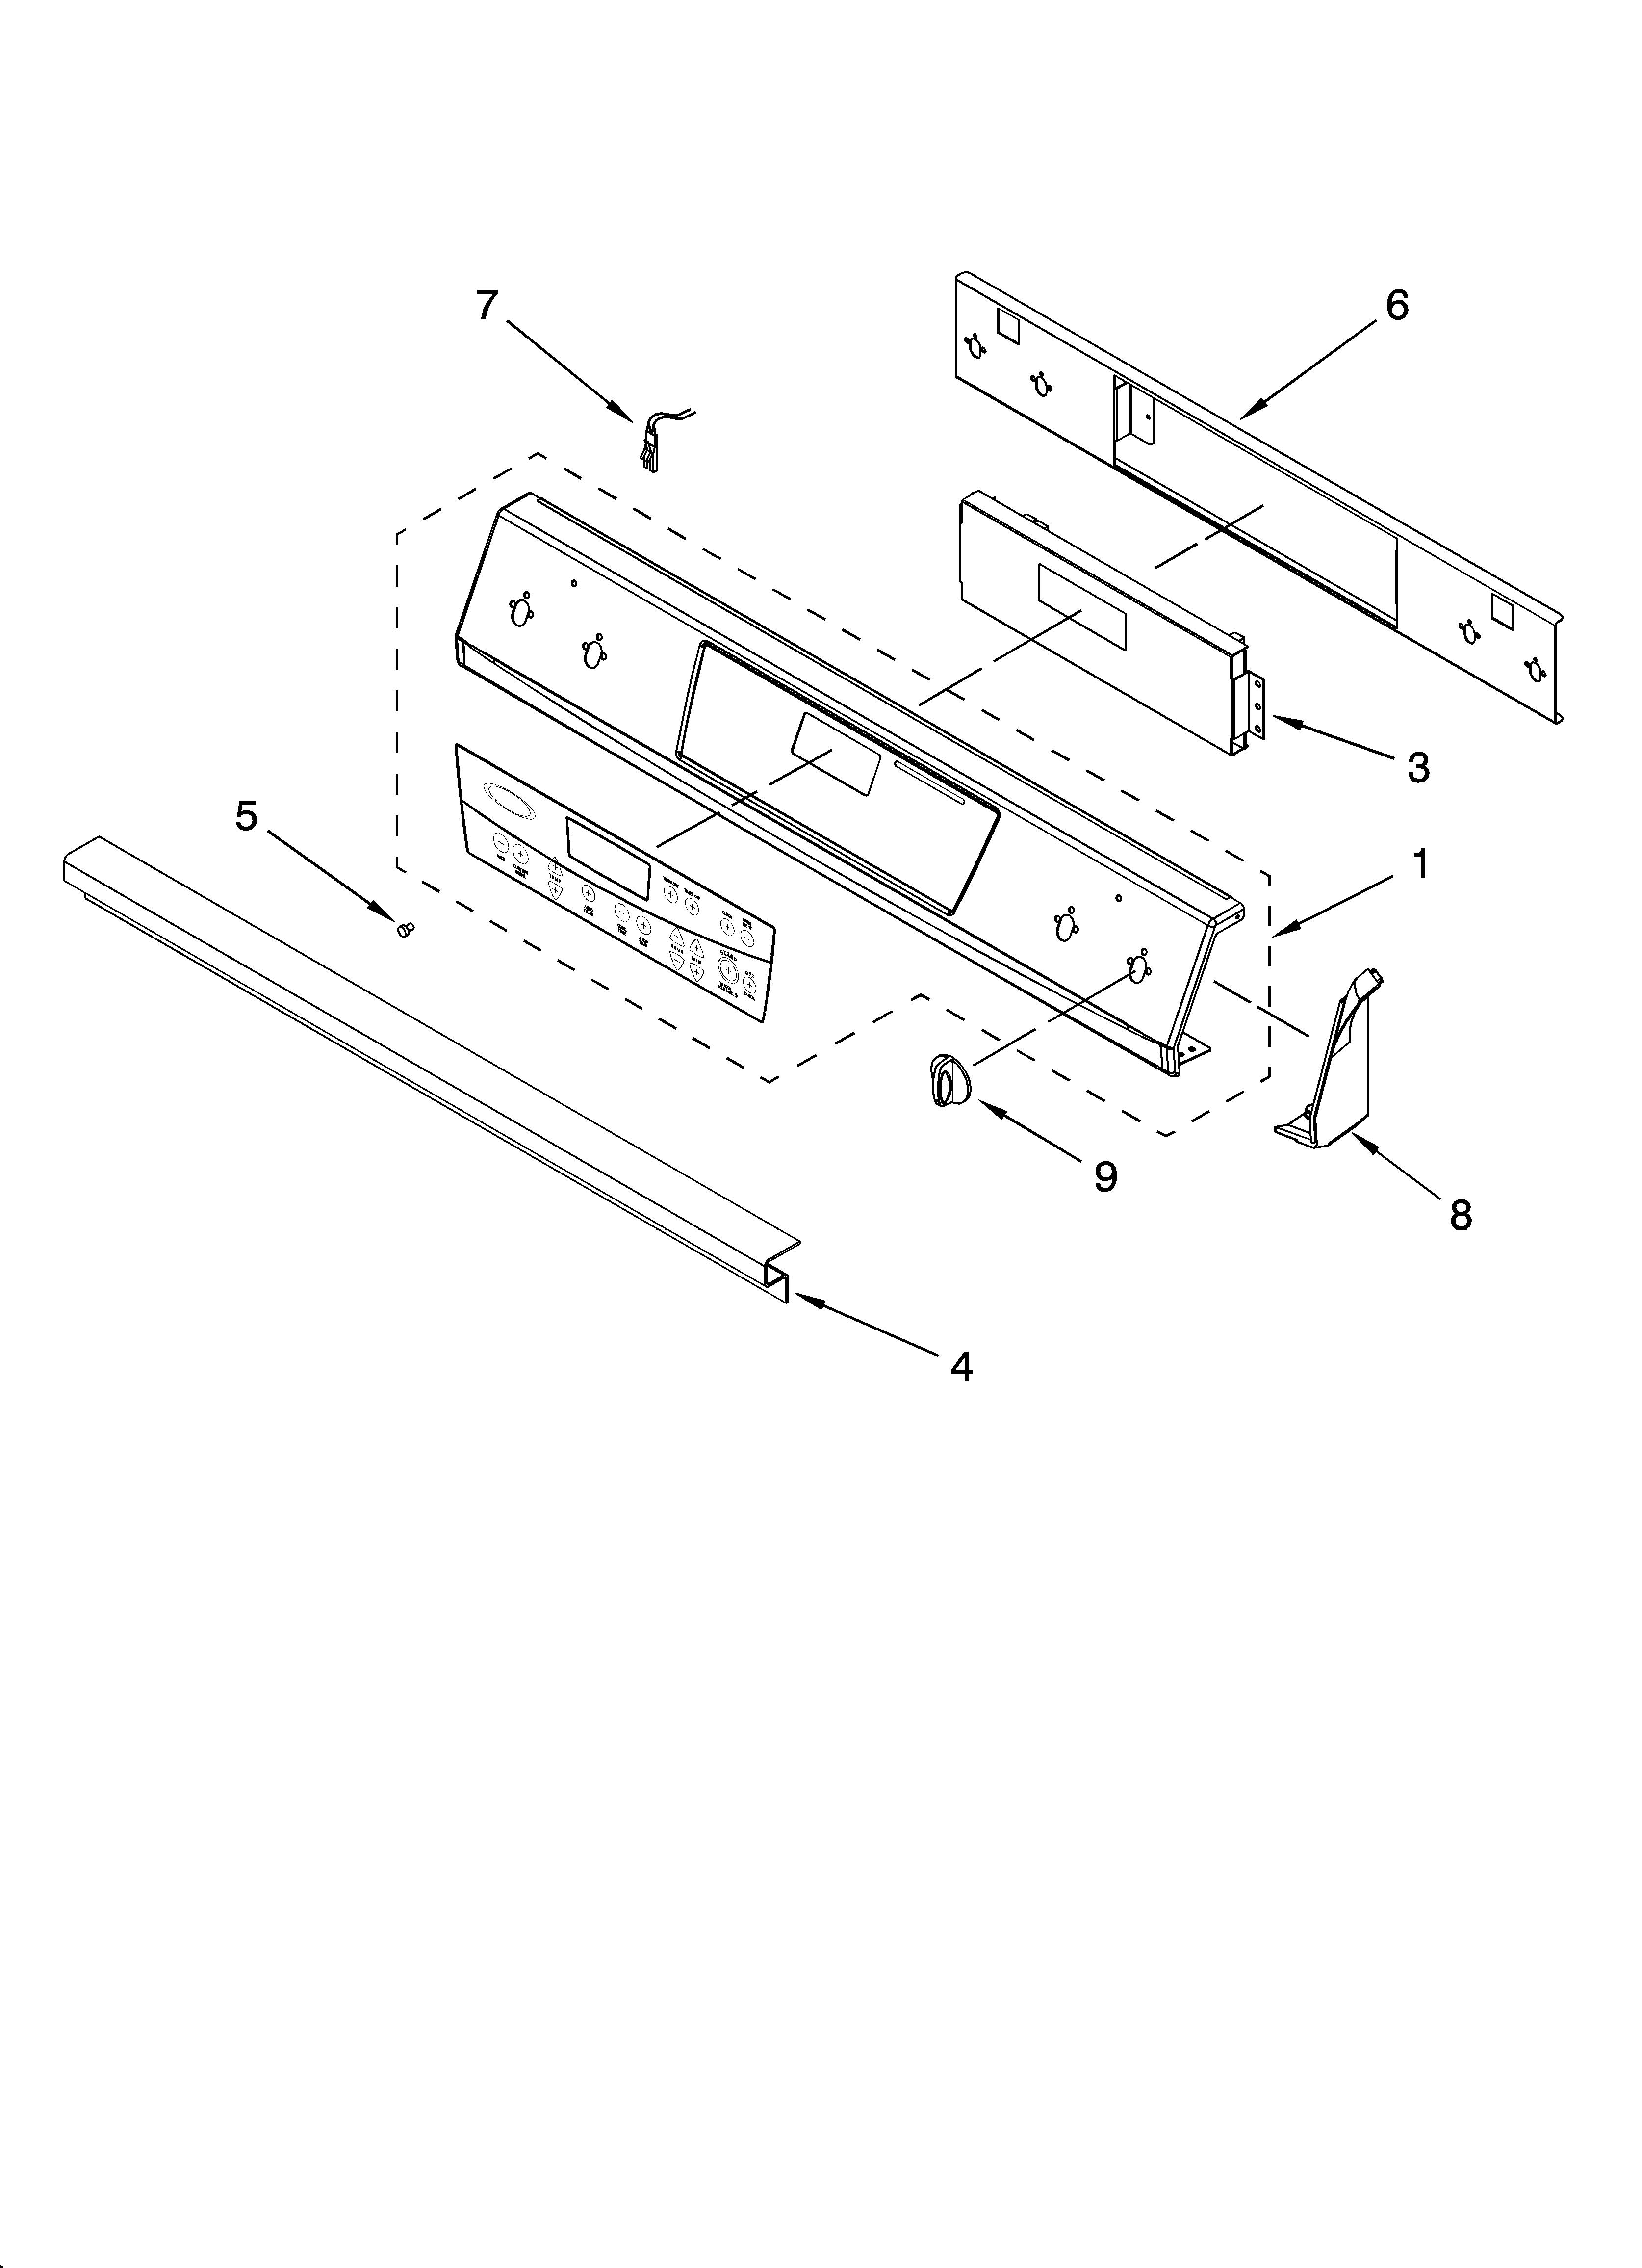 ygy398lxpb00 slide in range electric control panel parts diagram